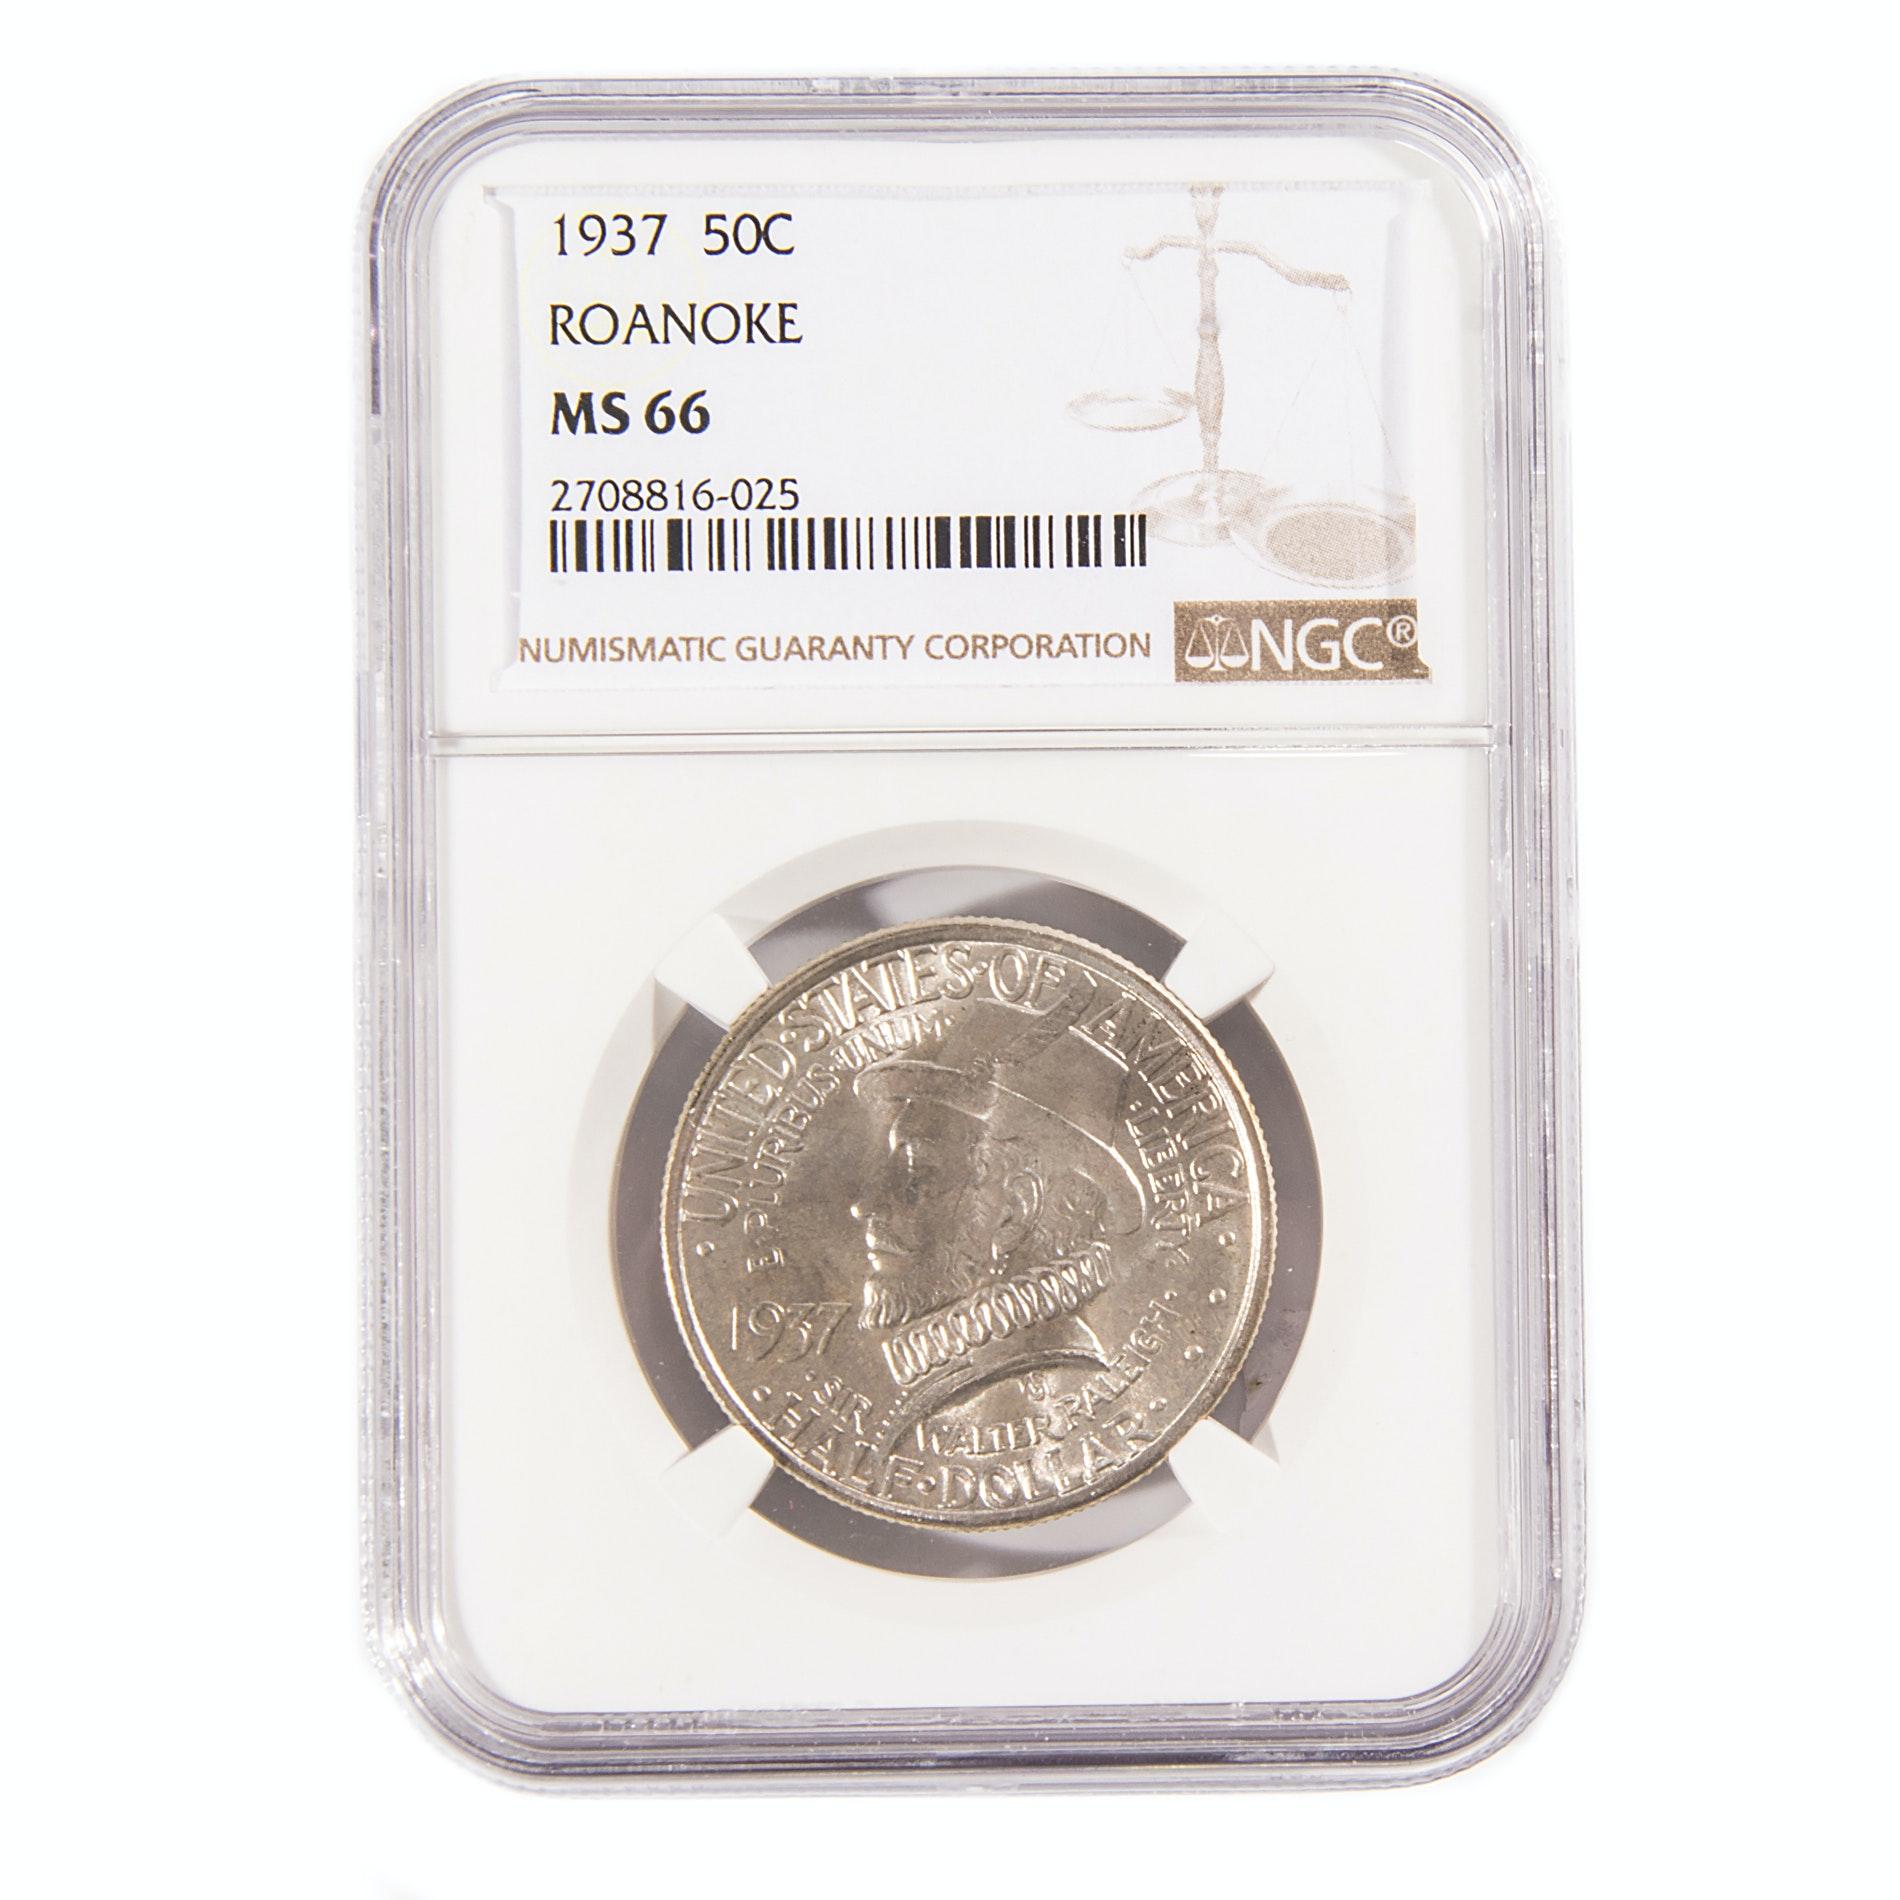 Graded MS 66 (By NGC) 1937 Roanoke Commemorative Silver Half Dollar